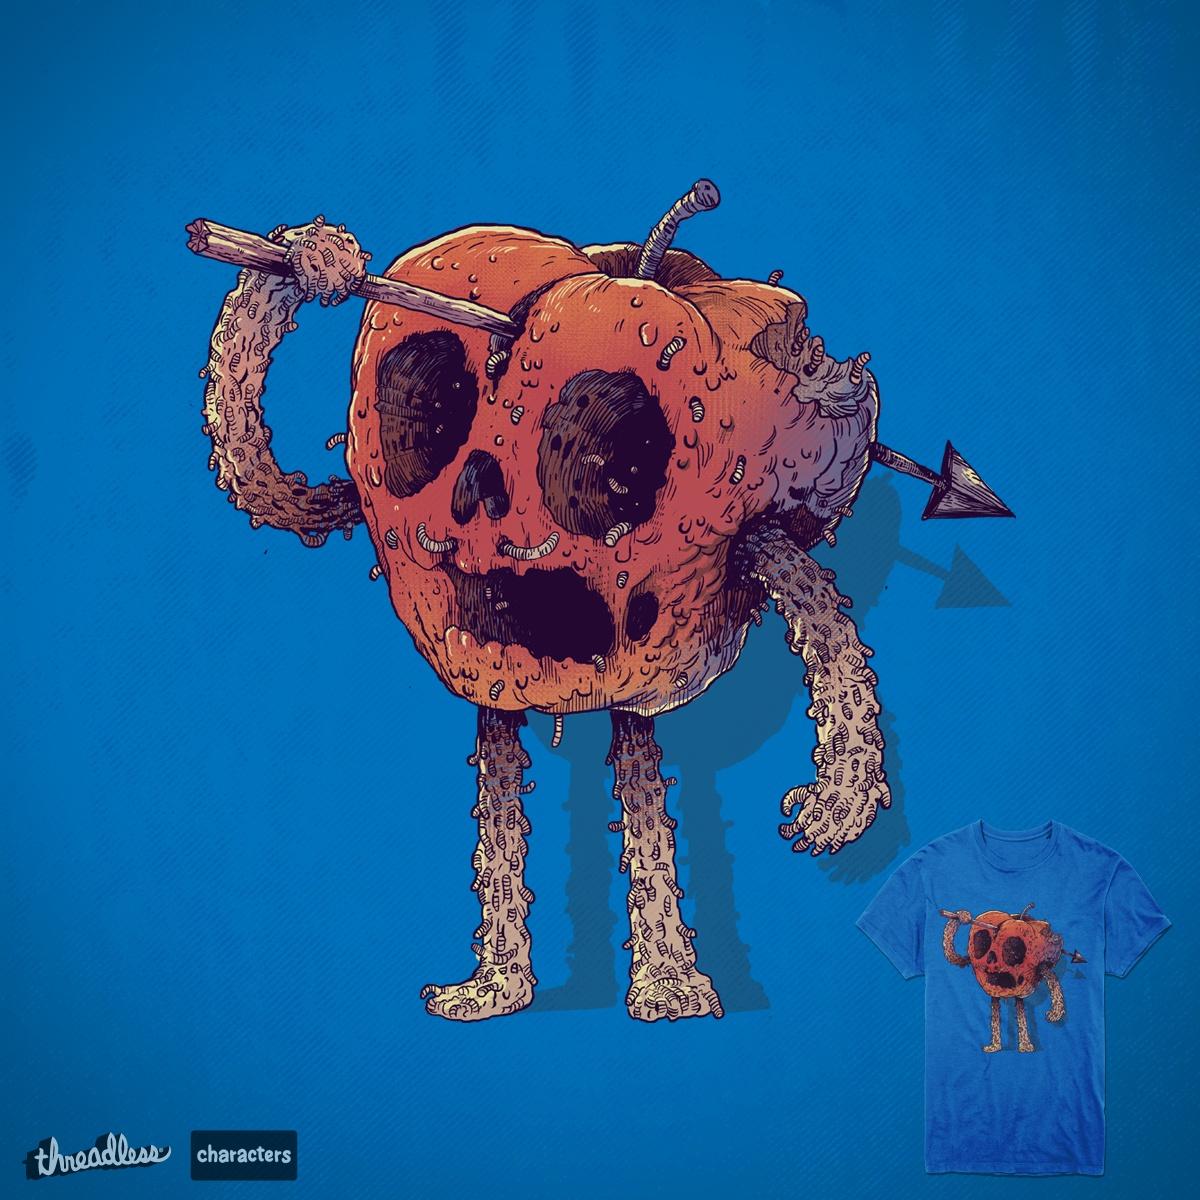 Rotten apple by digitalcarbine on Threadless